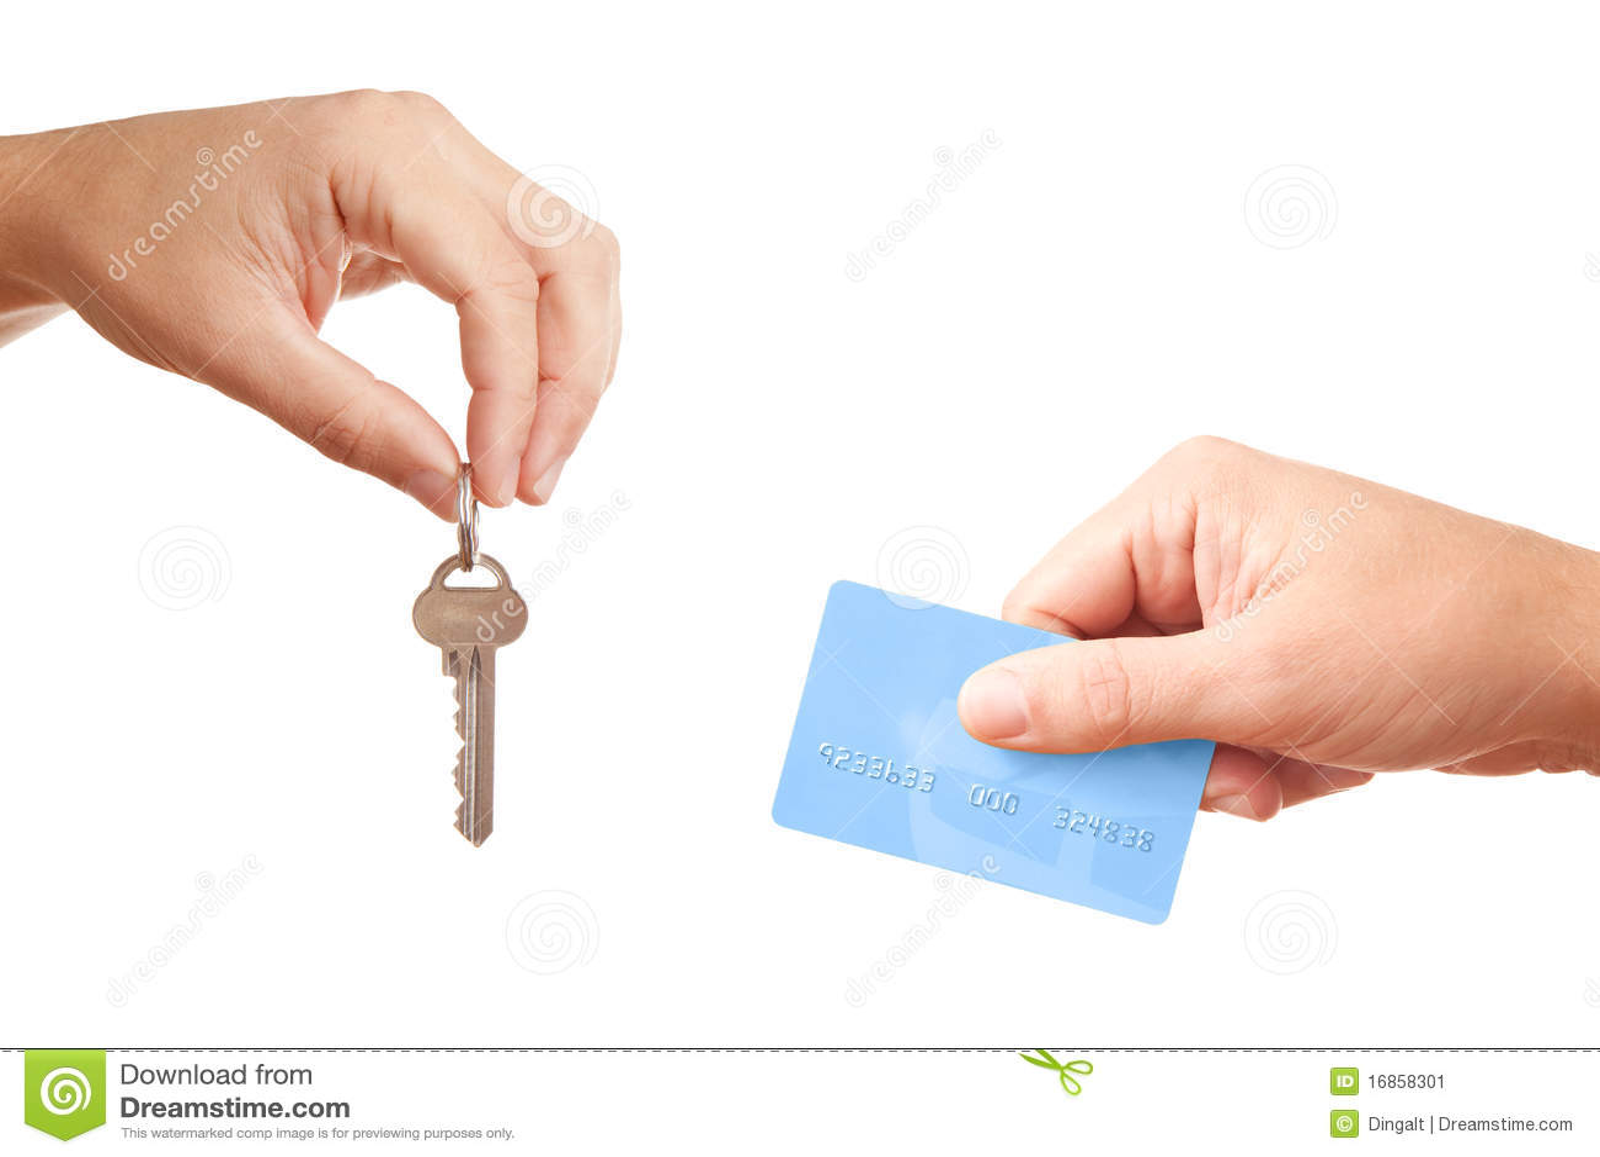 Vendendo ou deixando bens imobiliários